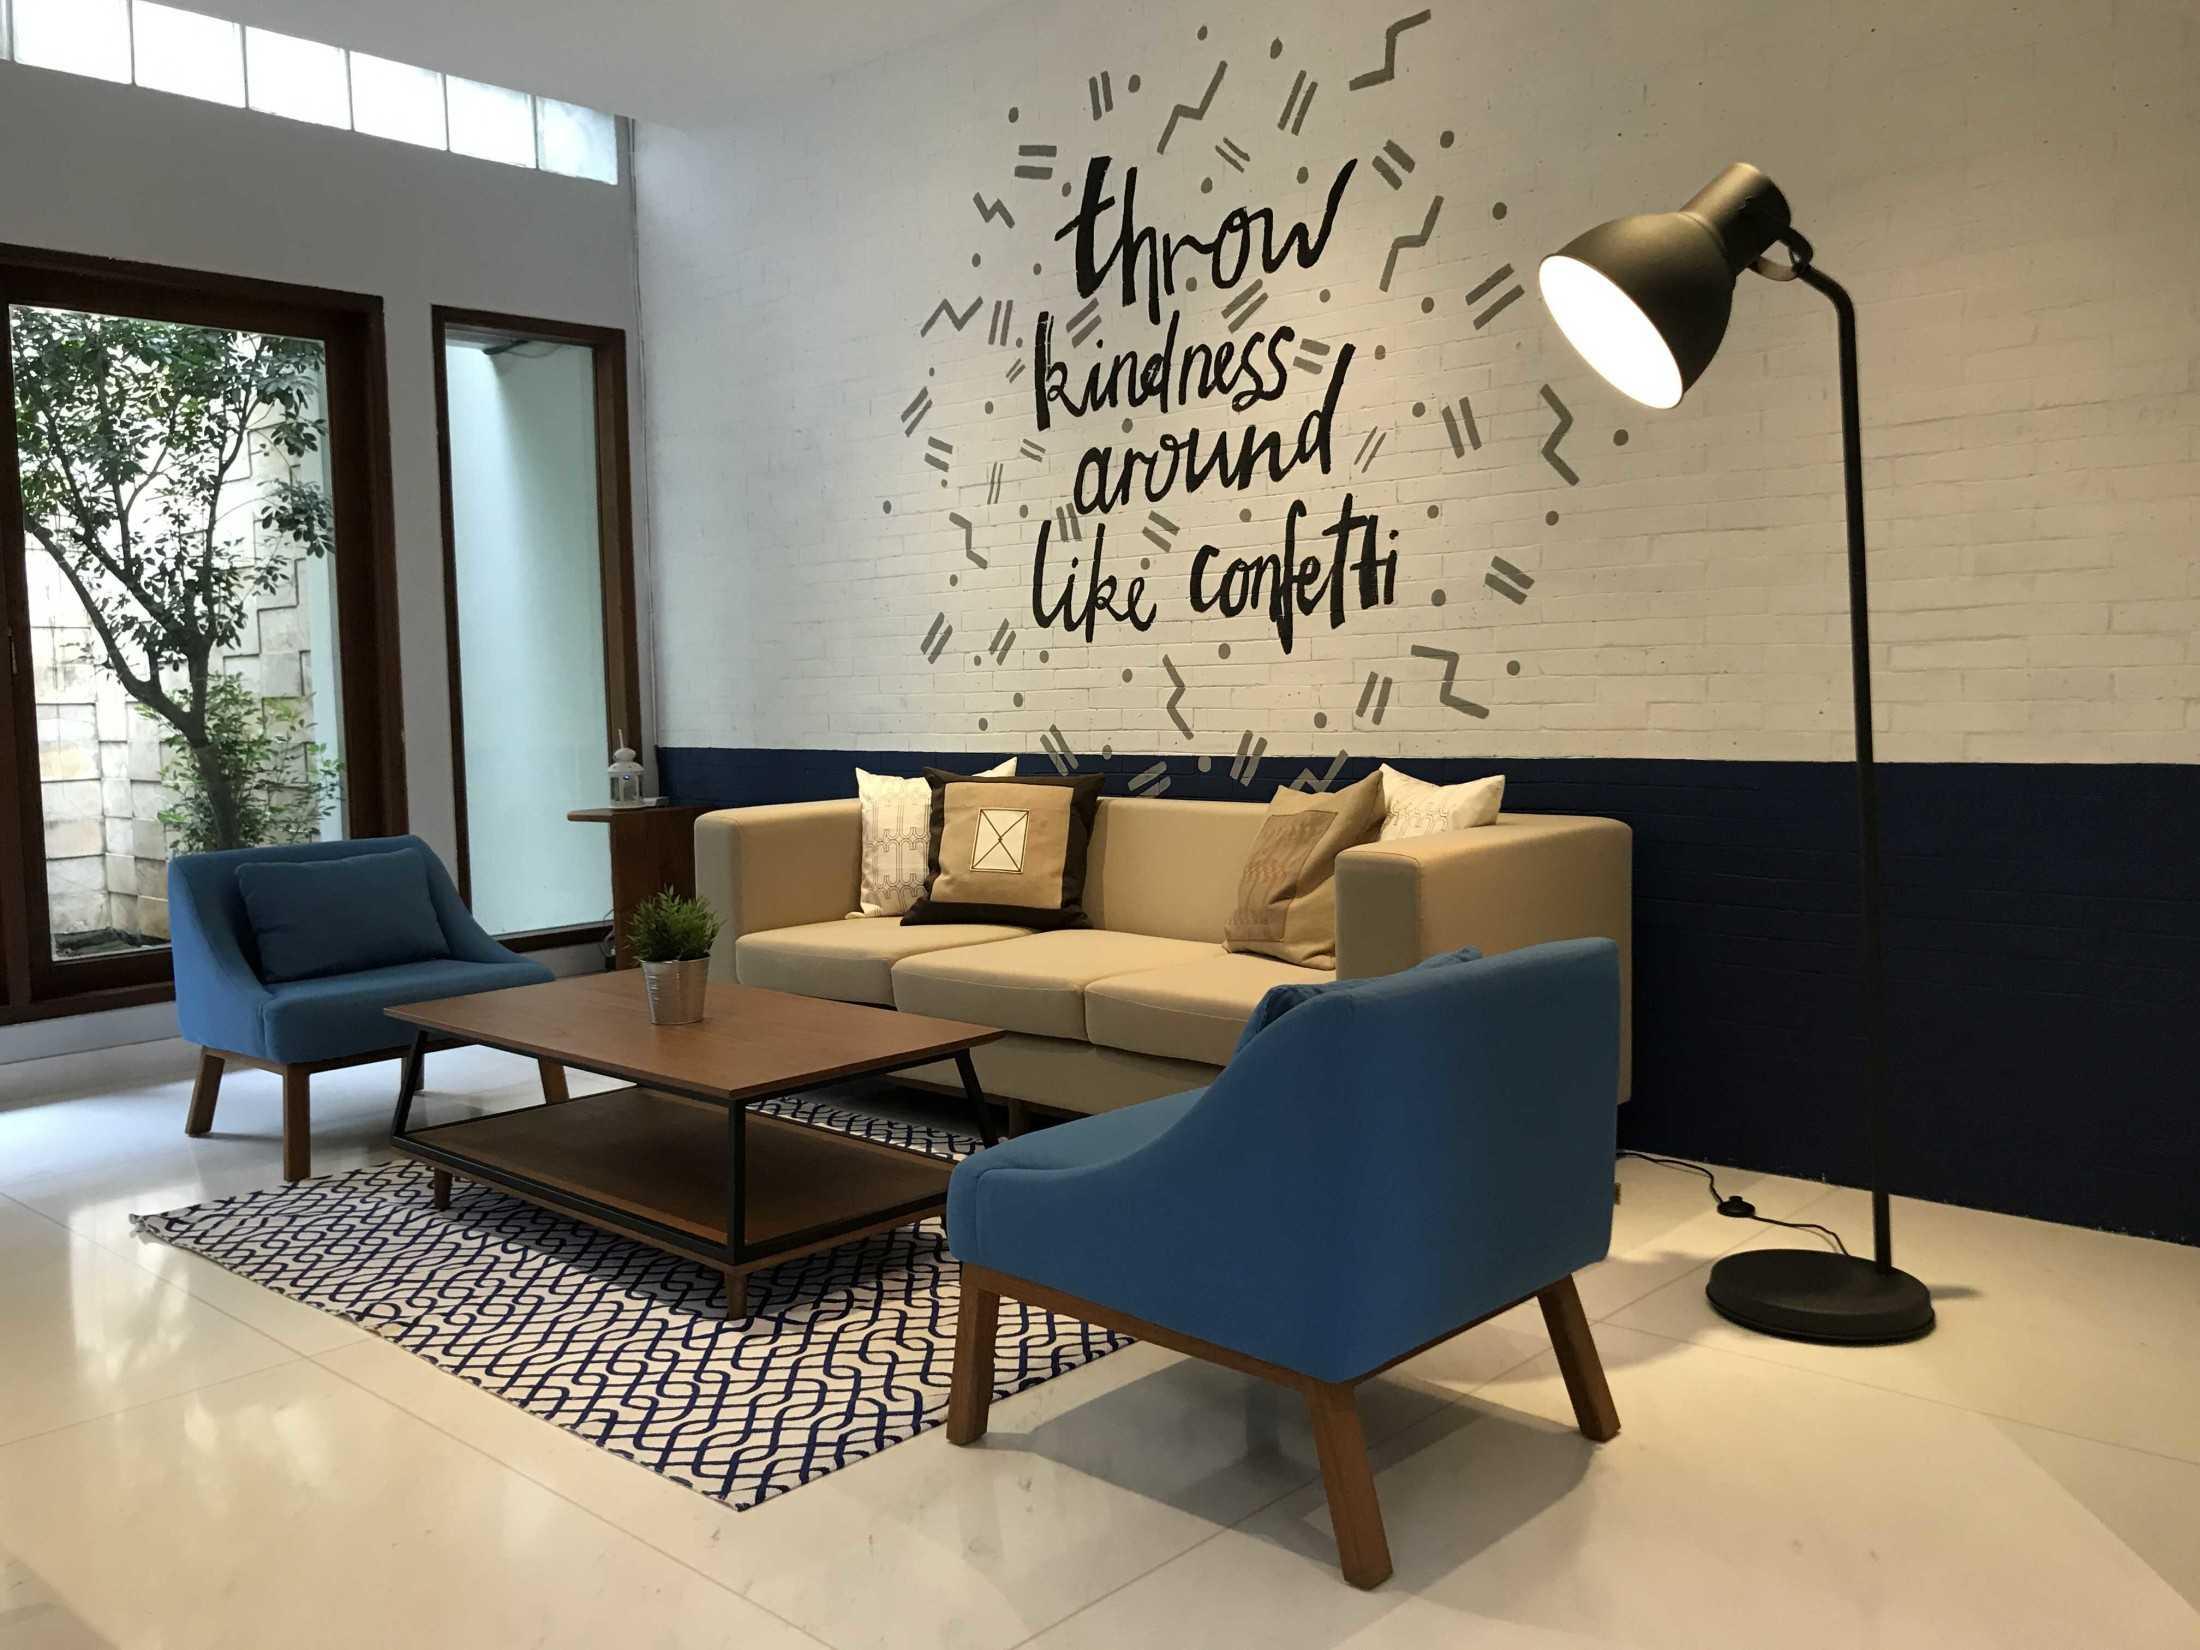 Home By Fabelio.com Komering Airbnb Gambir, Kota Jakarta Pusat, Daerah Khusus Ibukota Jakarta, Indonesia Gambir, Kota Jakarta Pusat, Daerah Khusus Ibukota Jakarta, Indonesia Living Room  53669